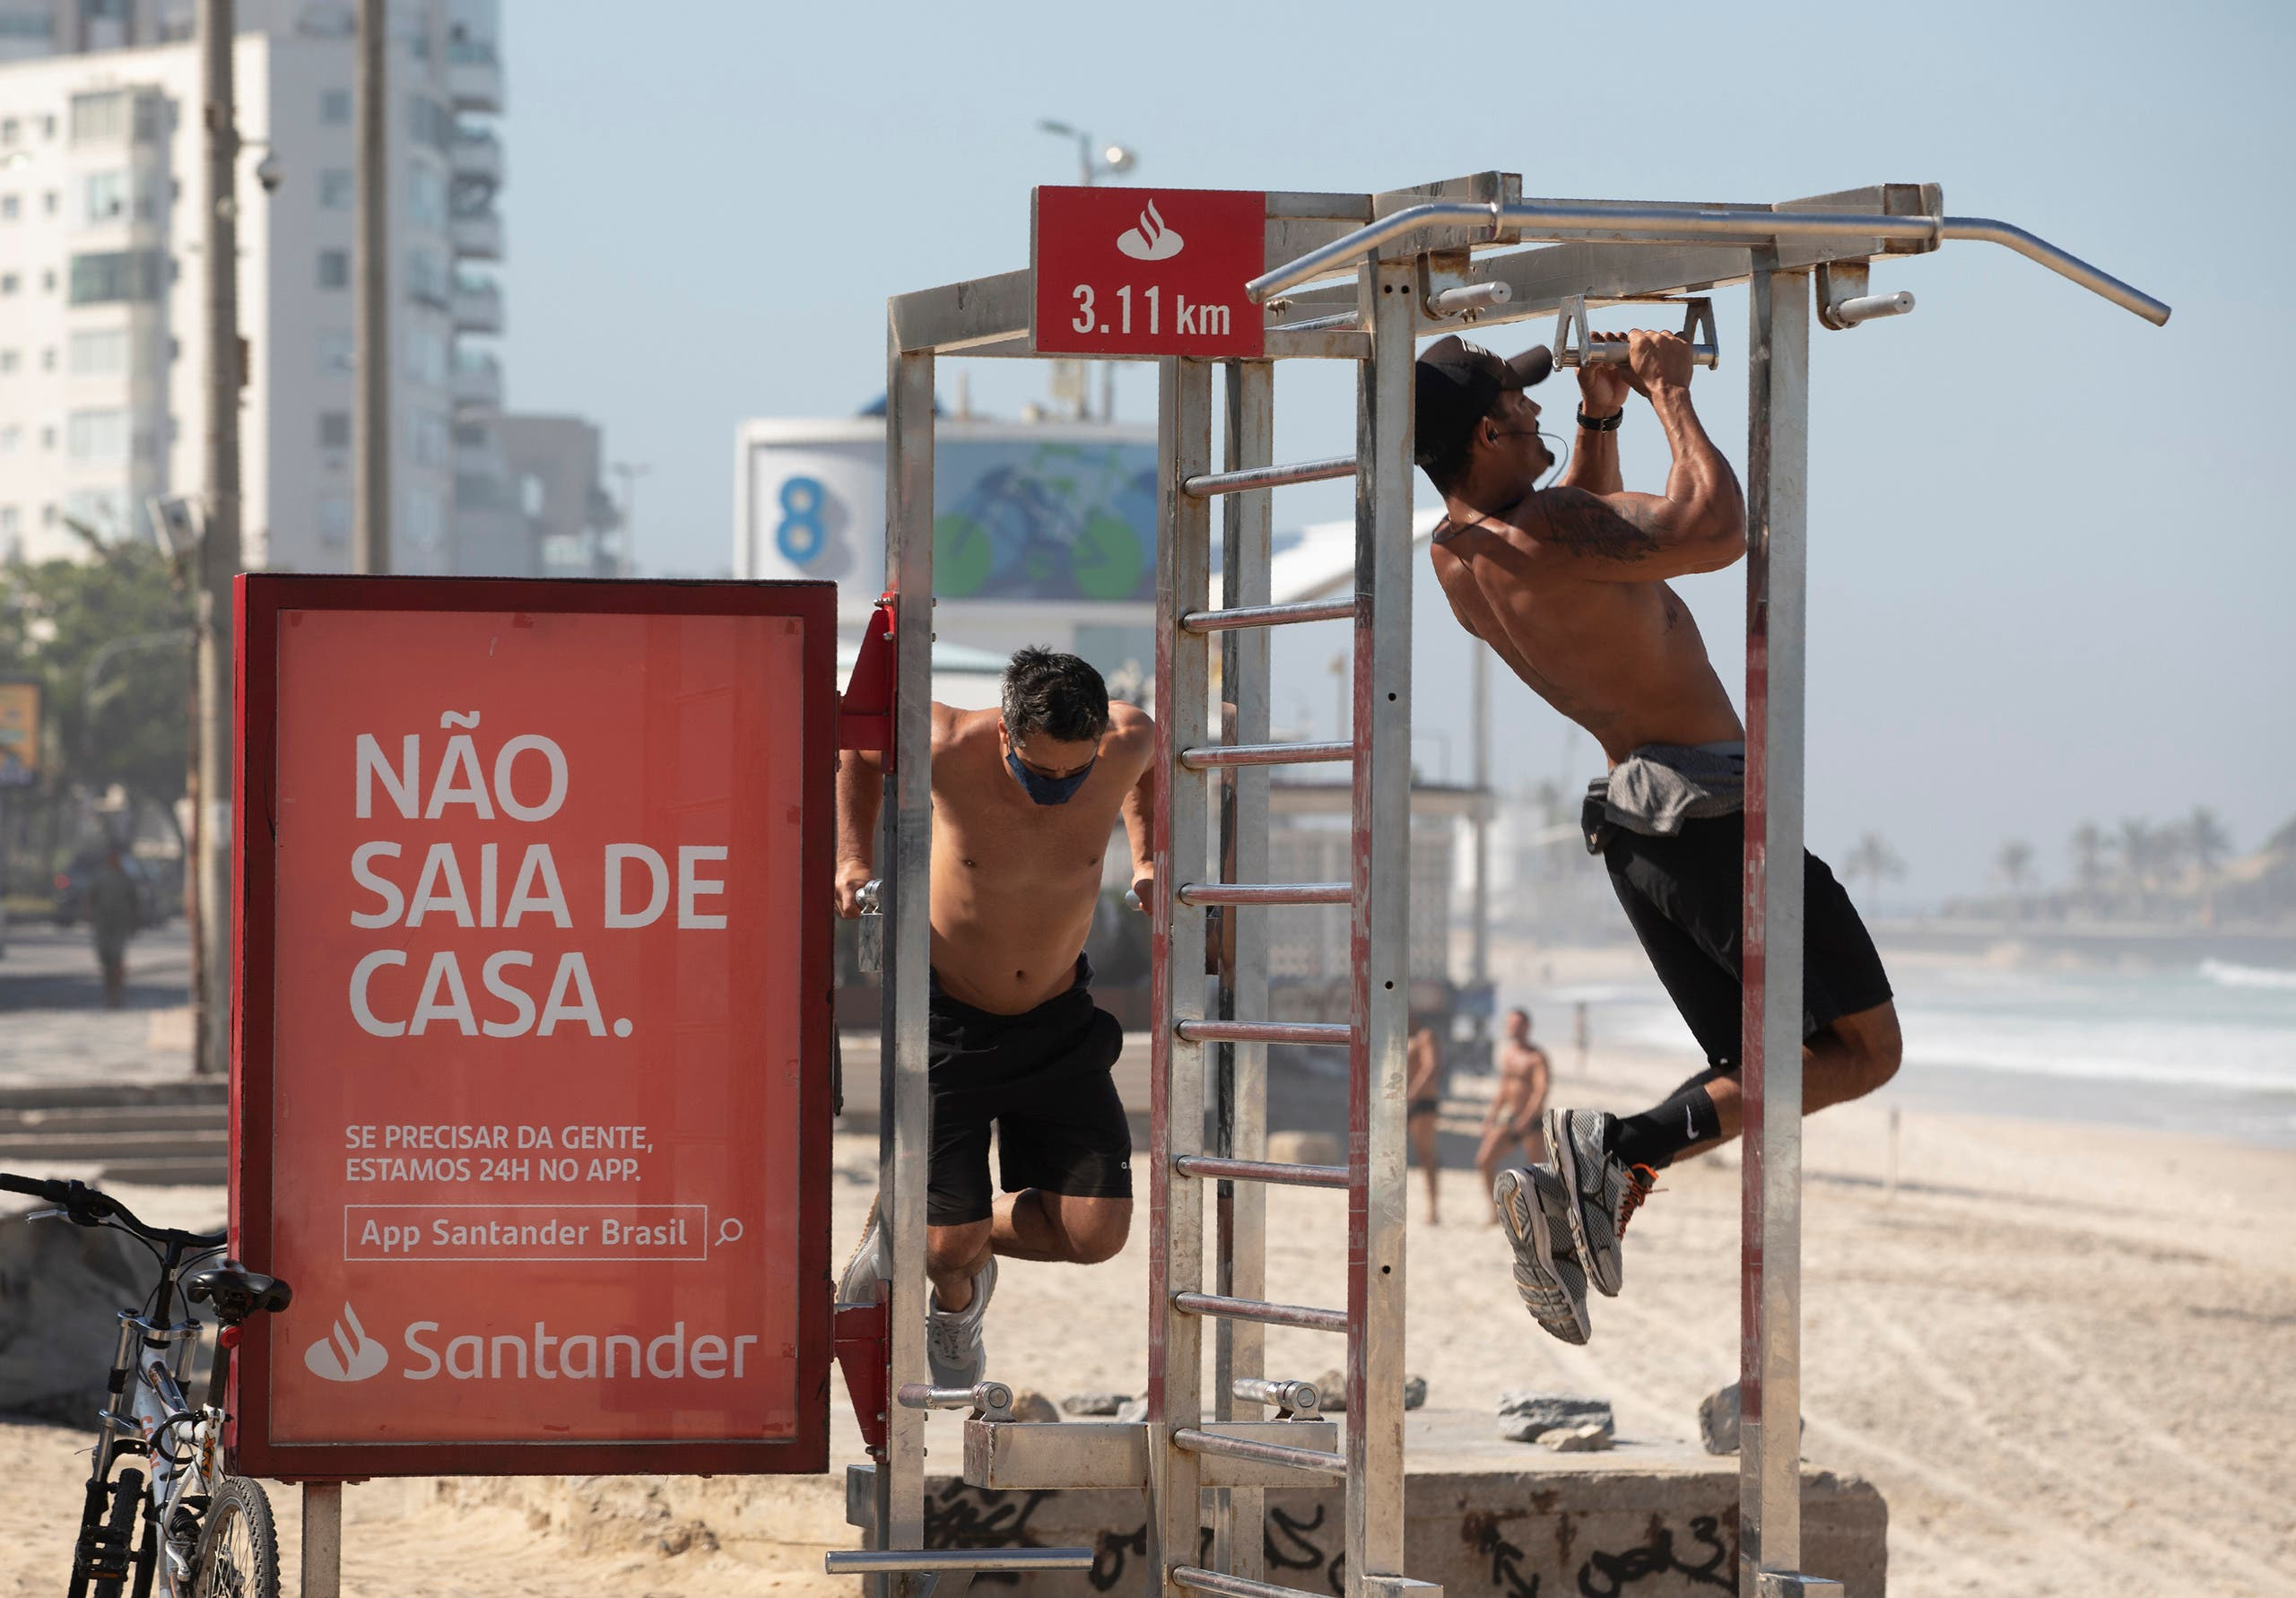 Men exercise on gym equipment on the sidewalk of Ipanema beach in Rio de Janeiro, Brazil on June 2, 2020. (AP)